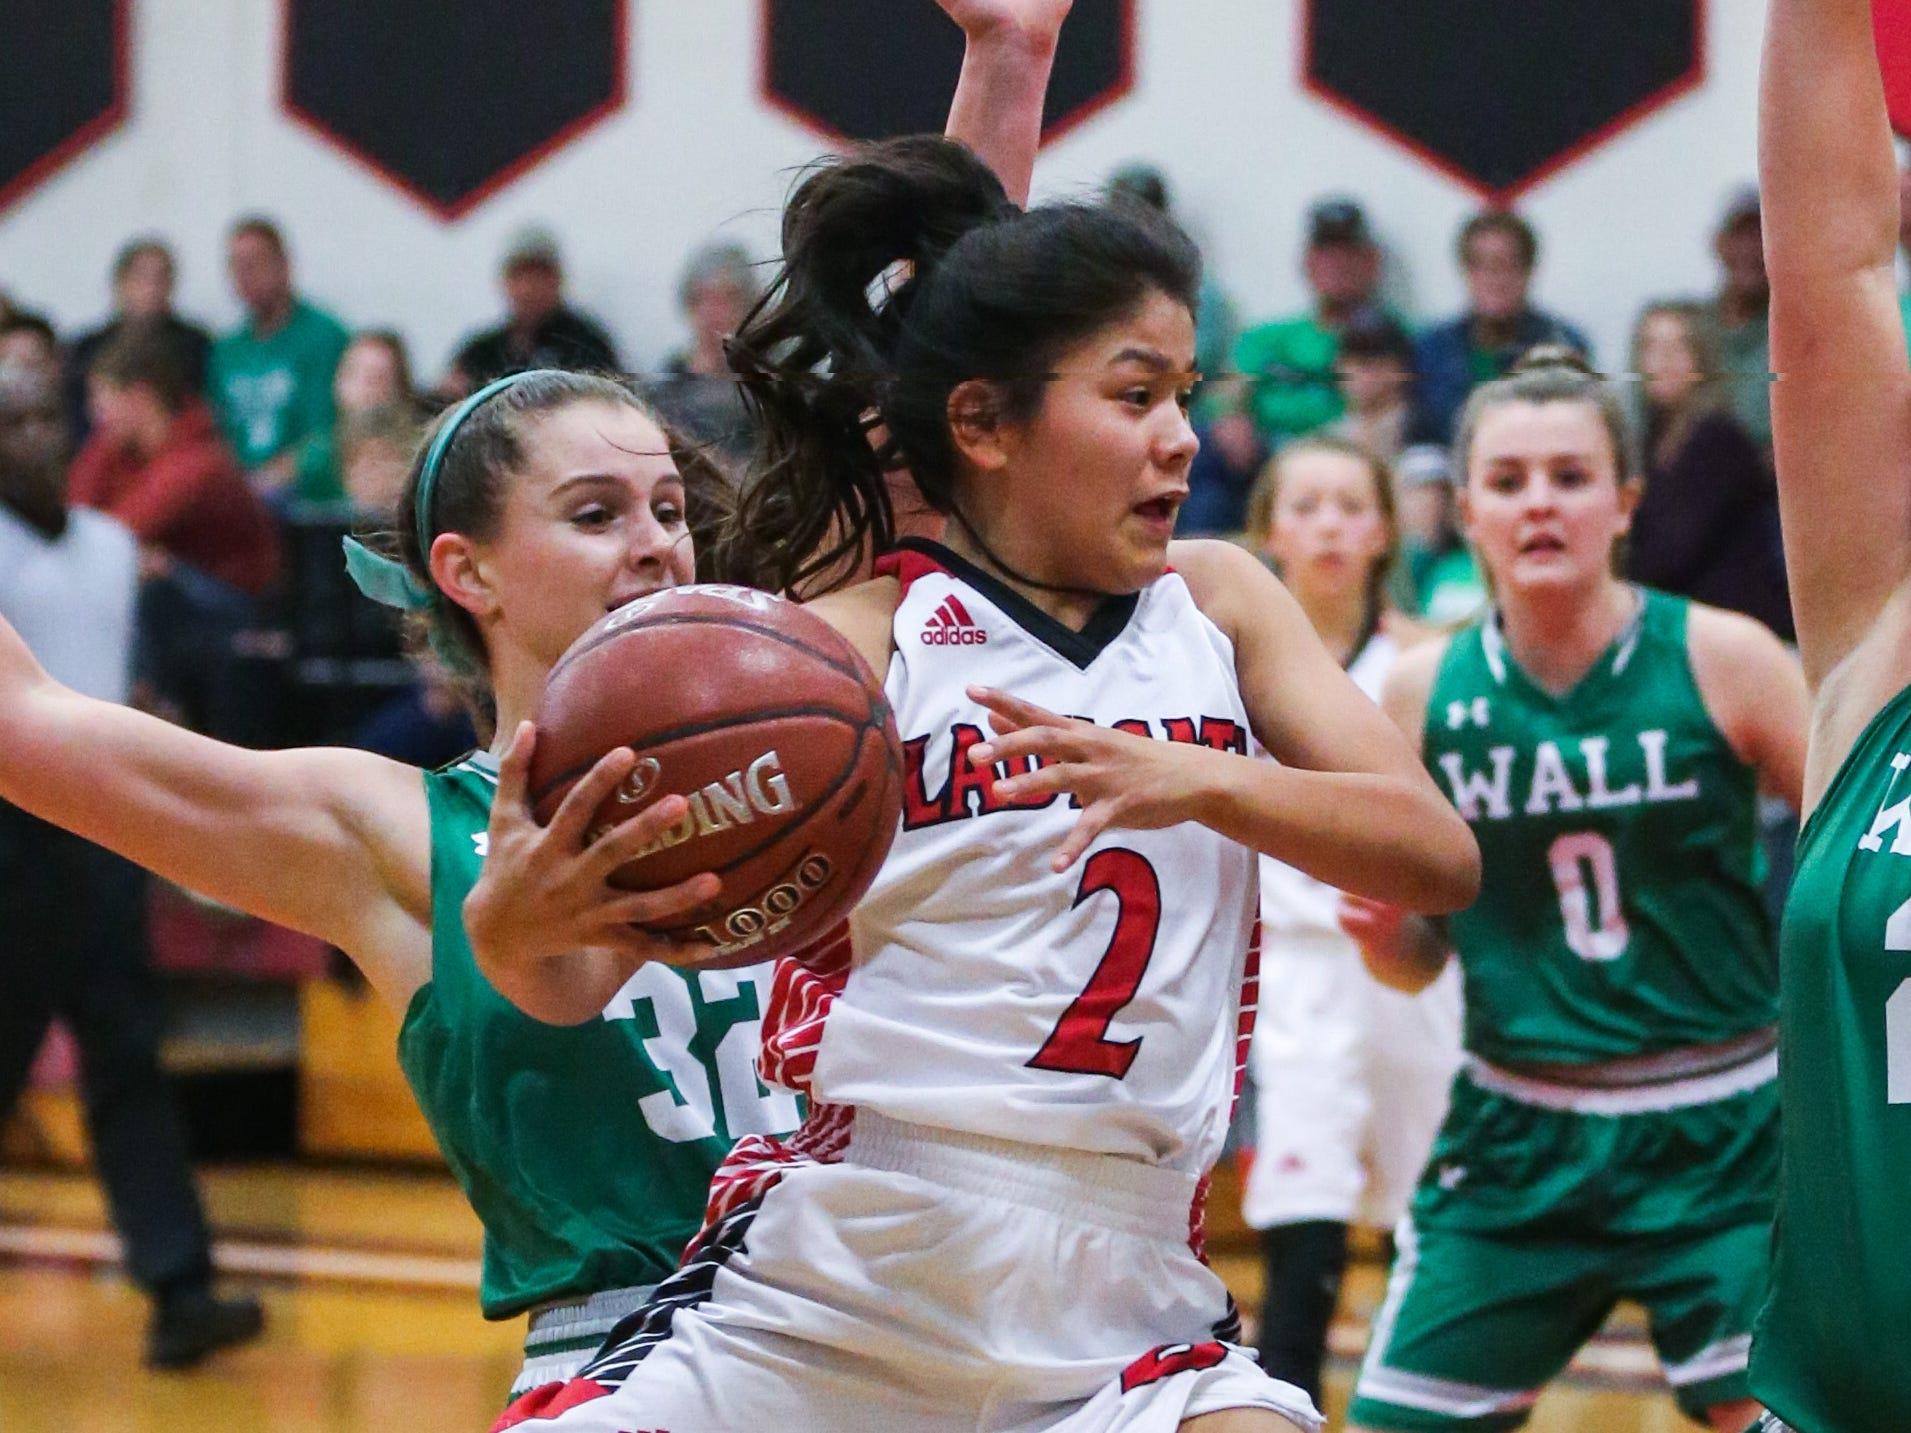 Ballinger's Rosemary Delgado jumps to shoot against Wall Tuesday, Jan. 8, 2019, in Ballinger High School.